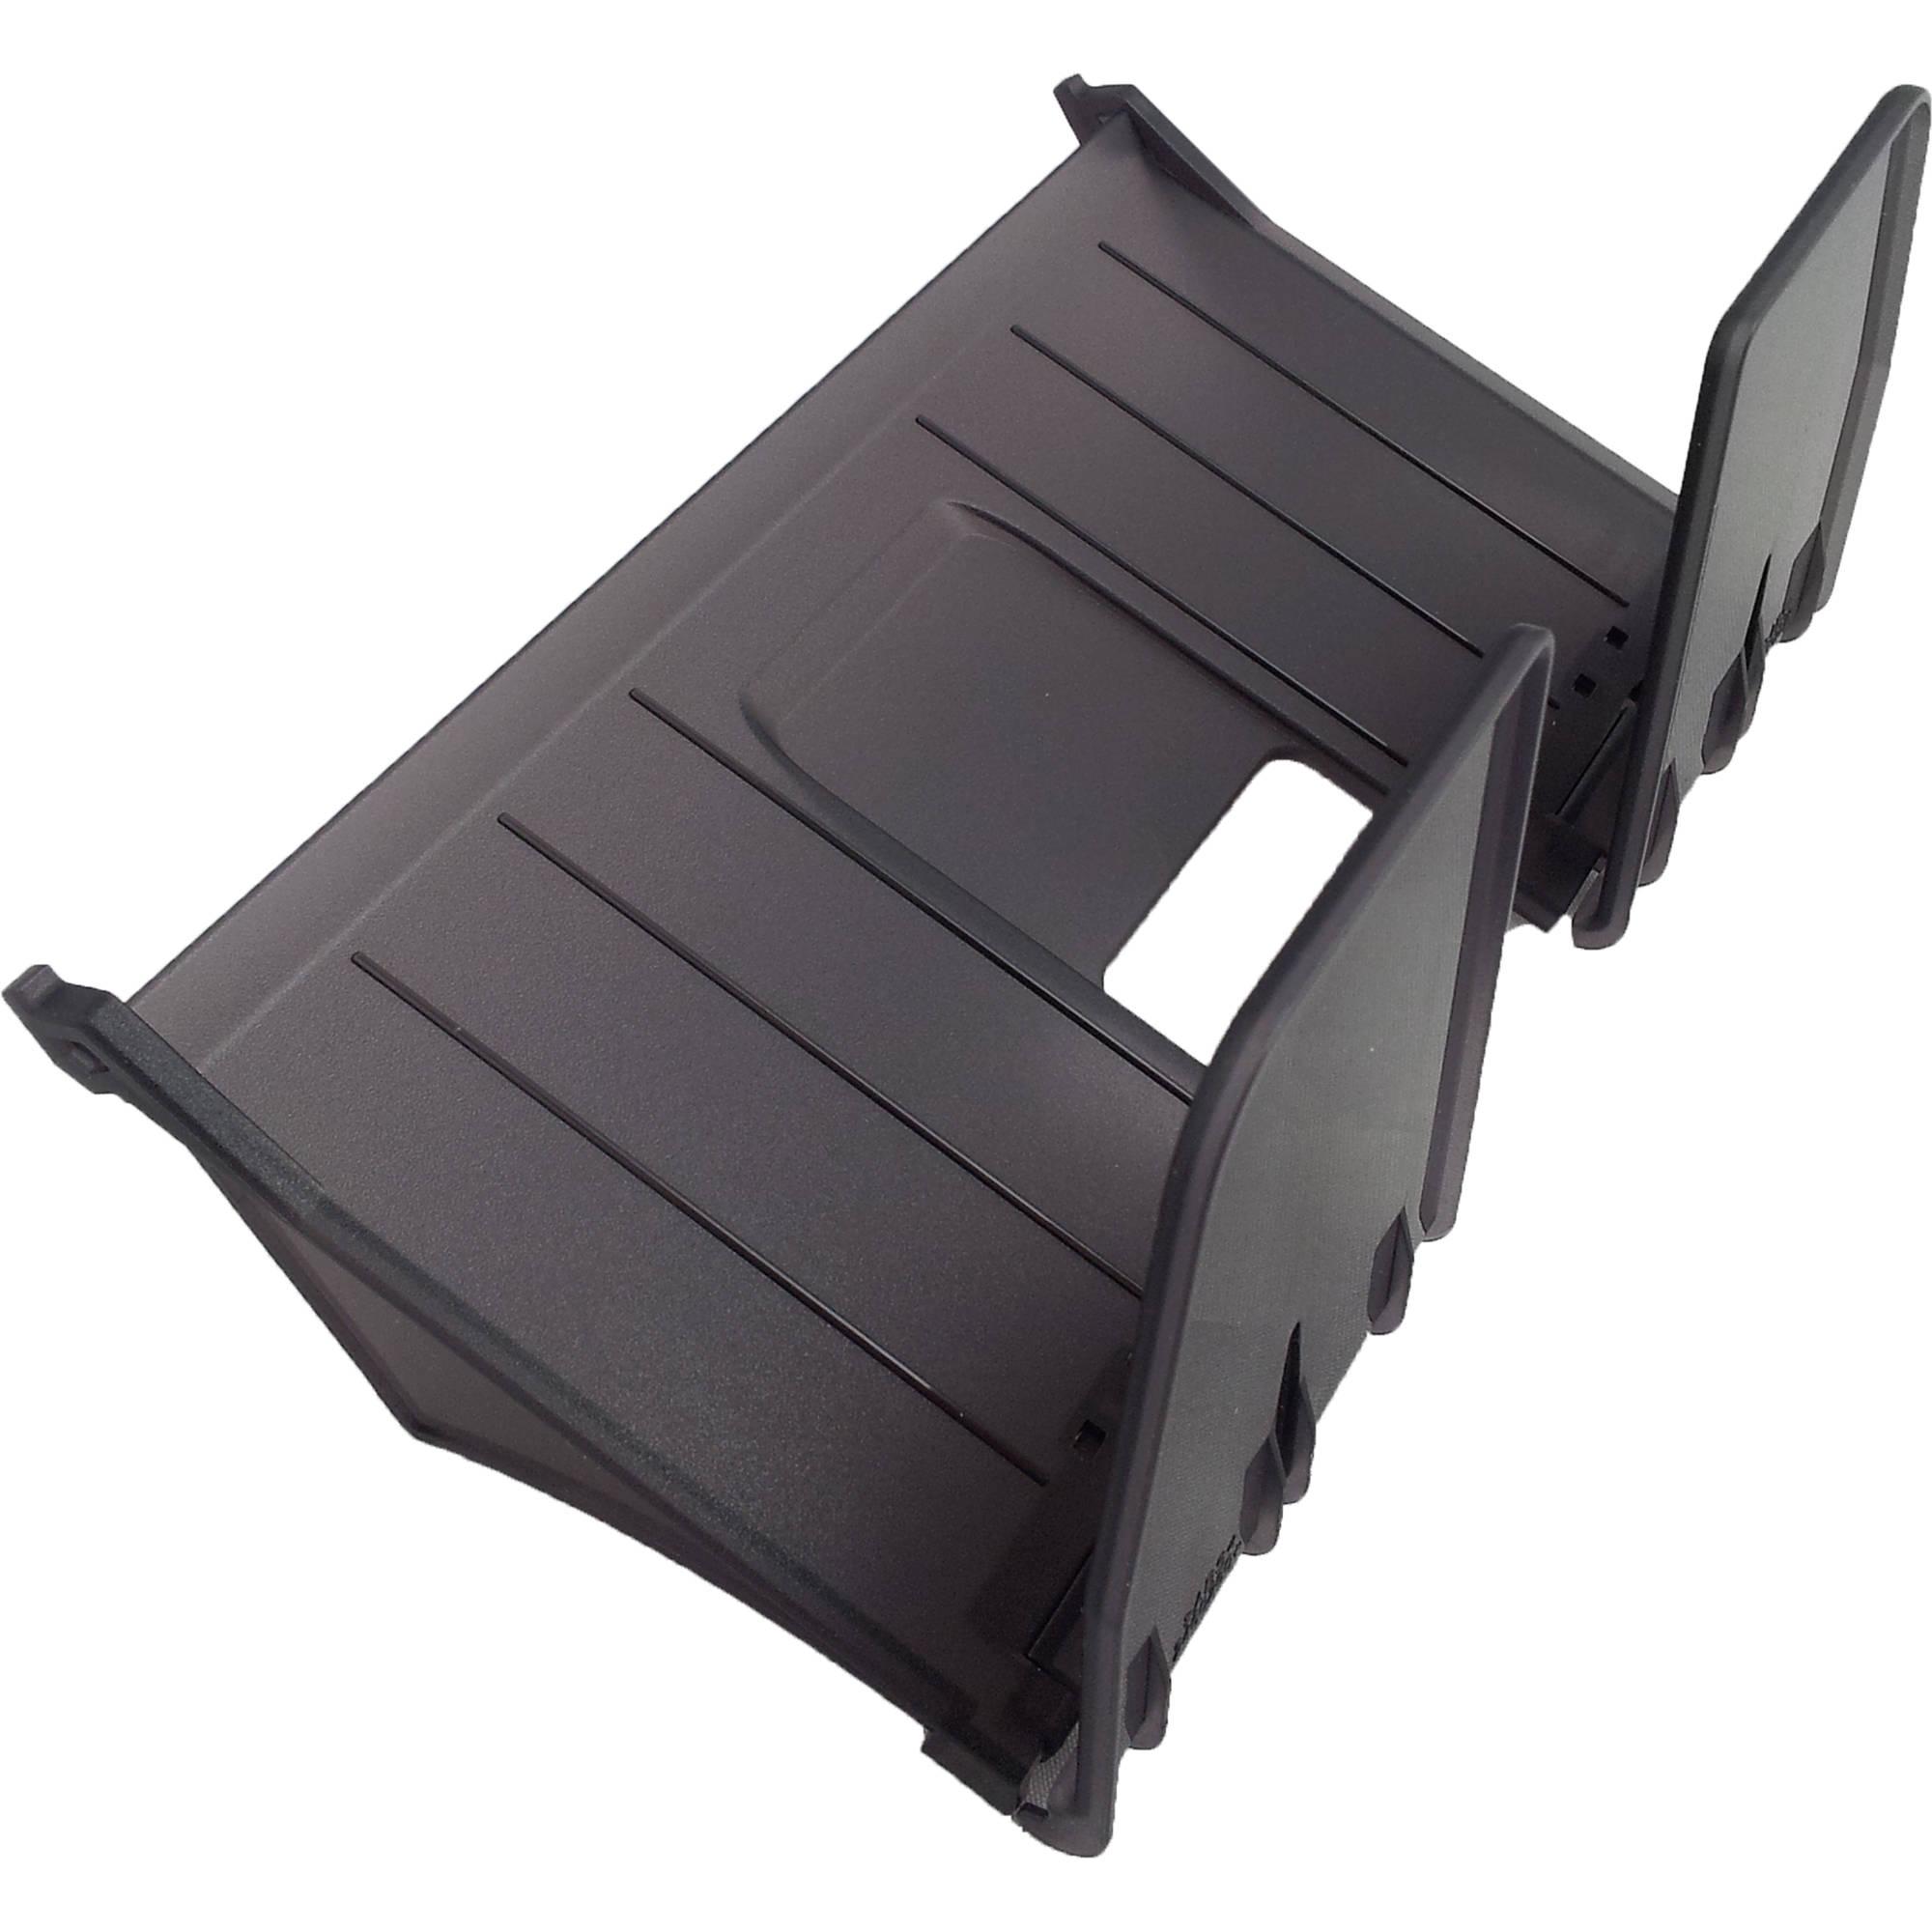 Dnp 4 X 6 Plastic Print Catcher For Ds620a 23208790s Bh